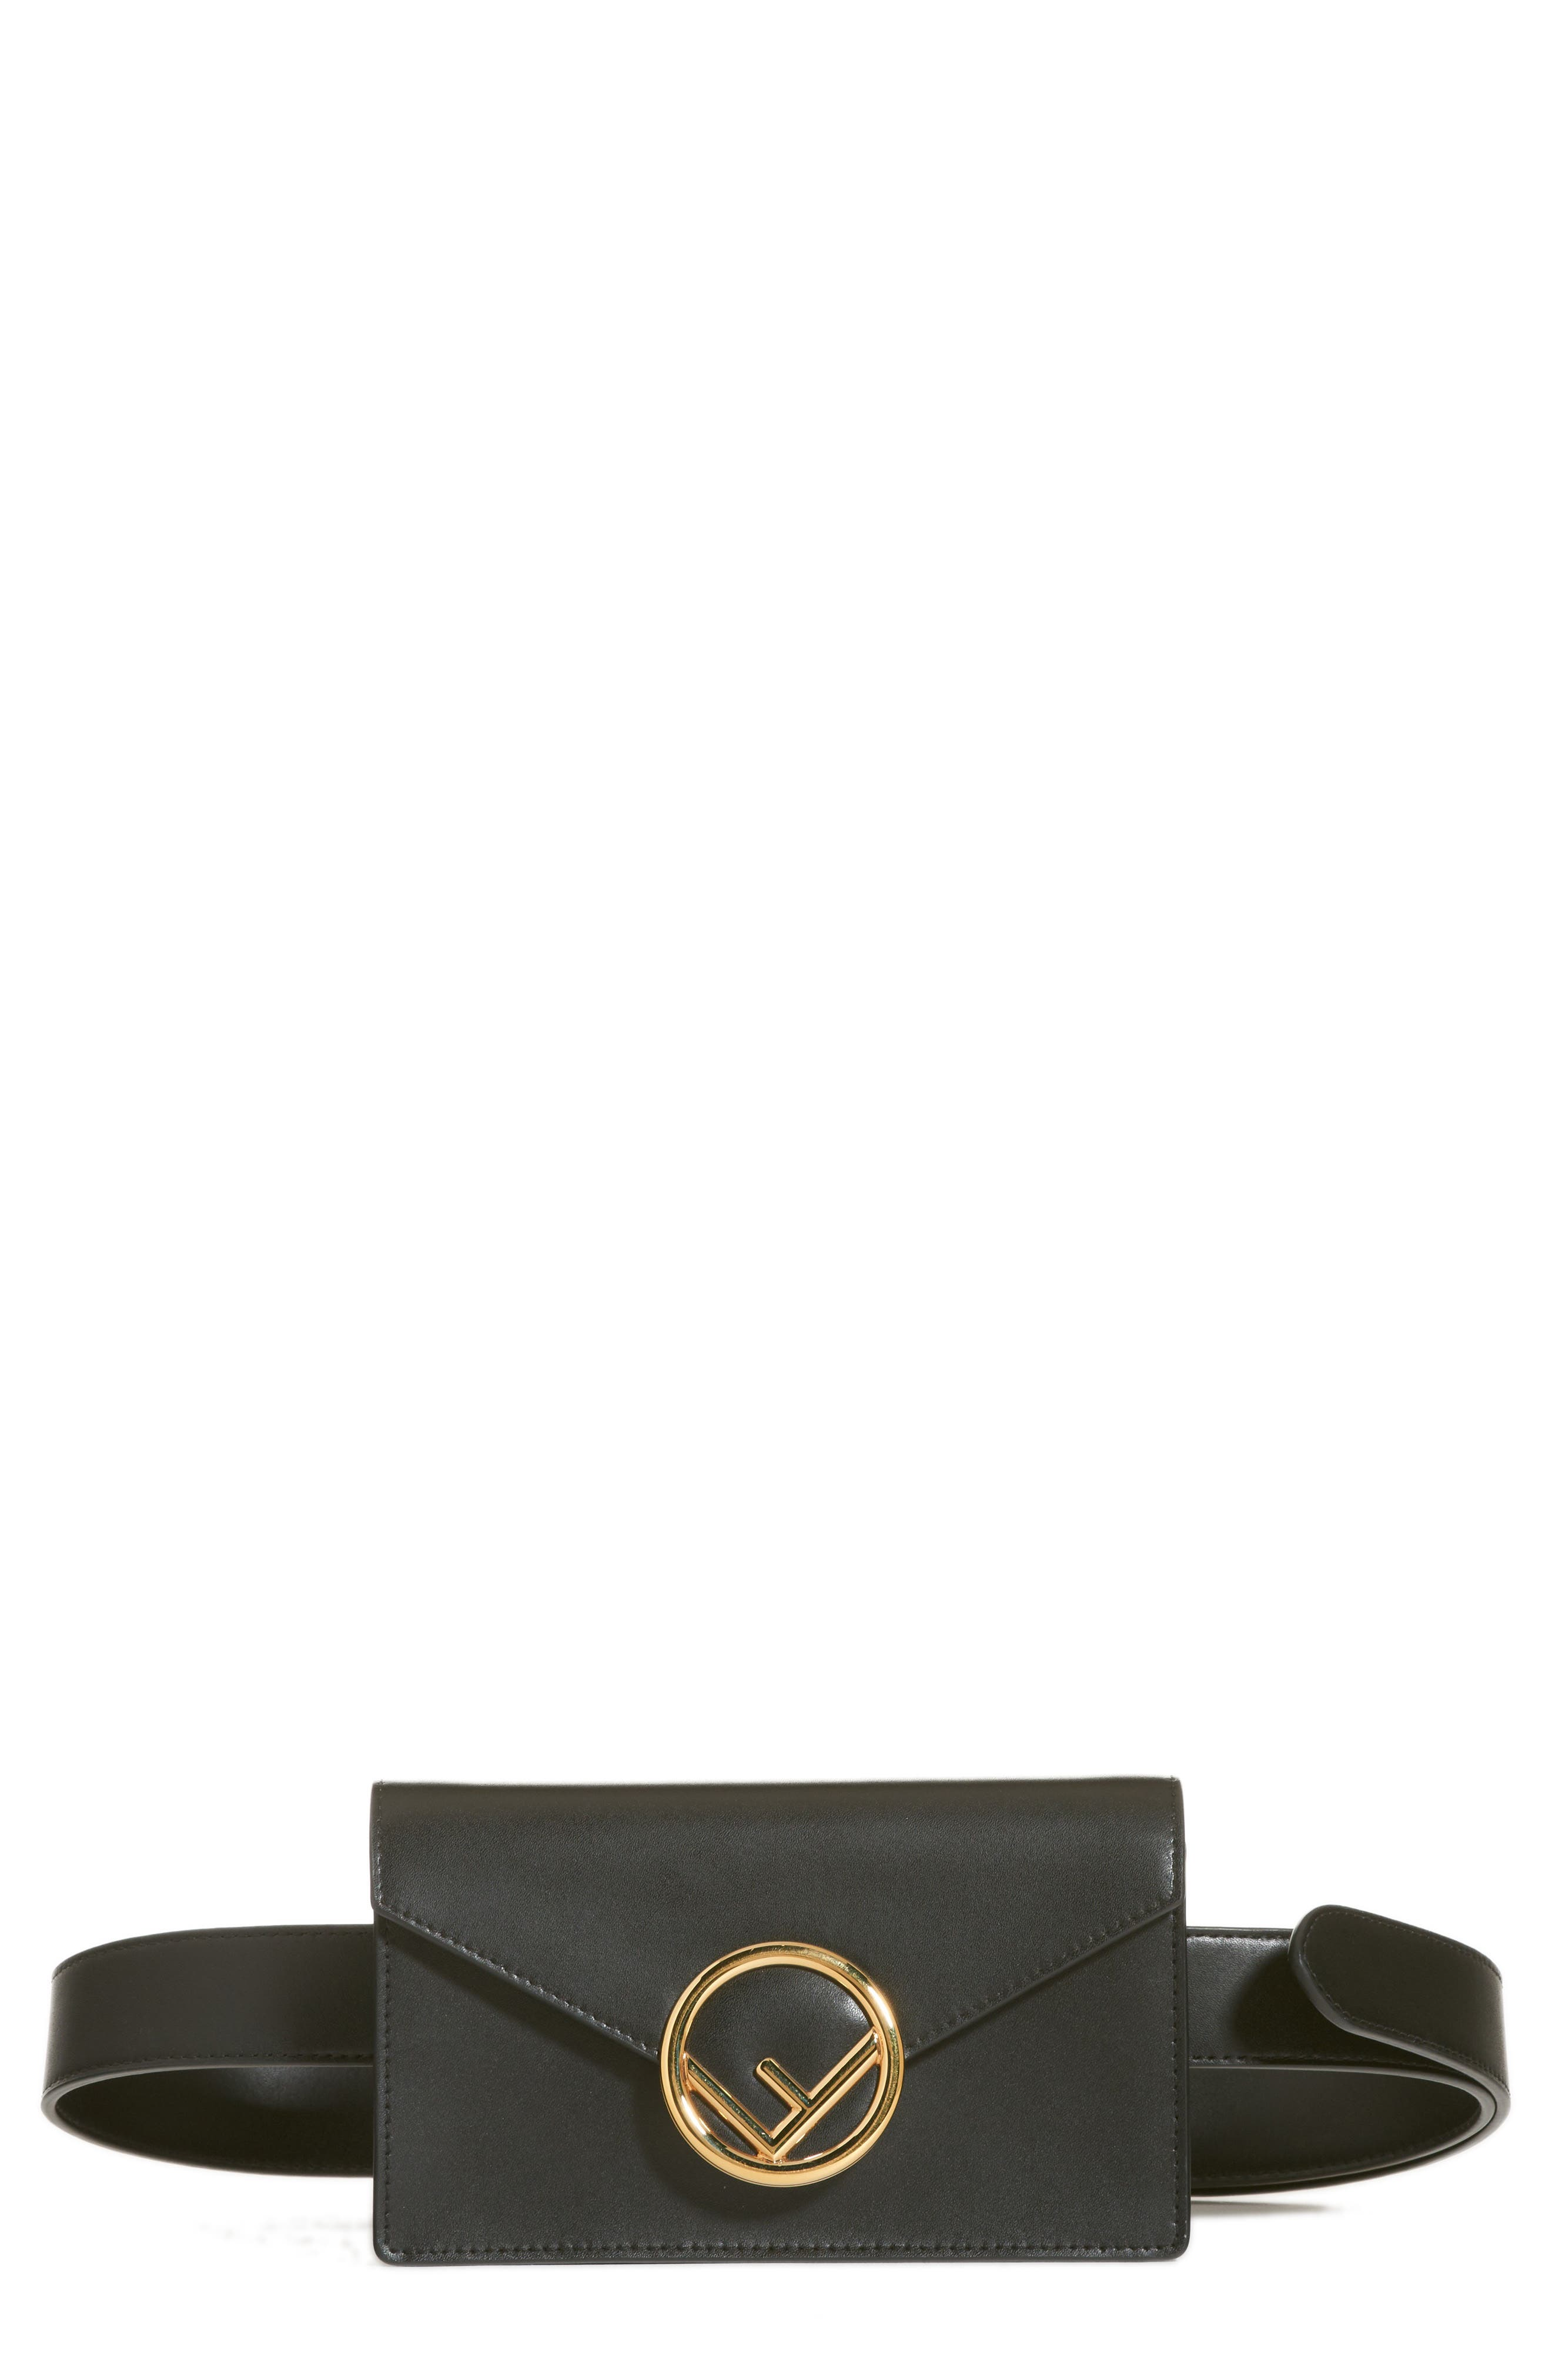 Fendi Liberty Logo Calfskin Leather Belt Bag